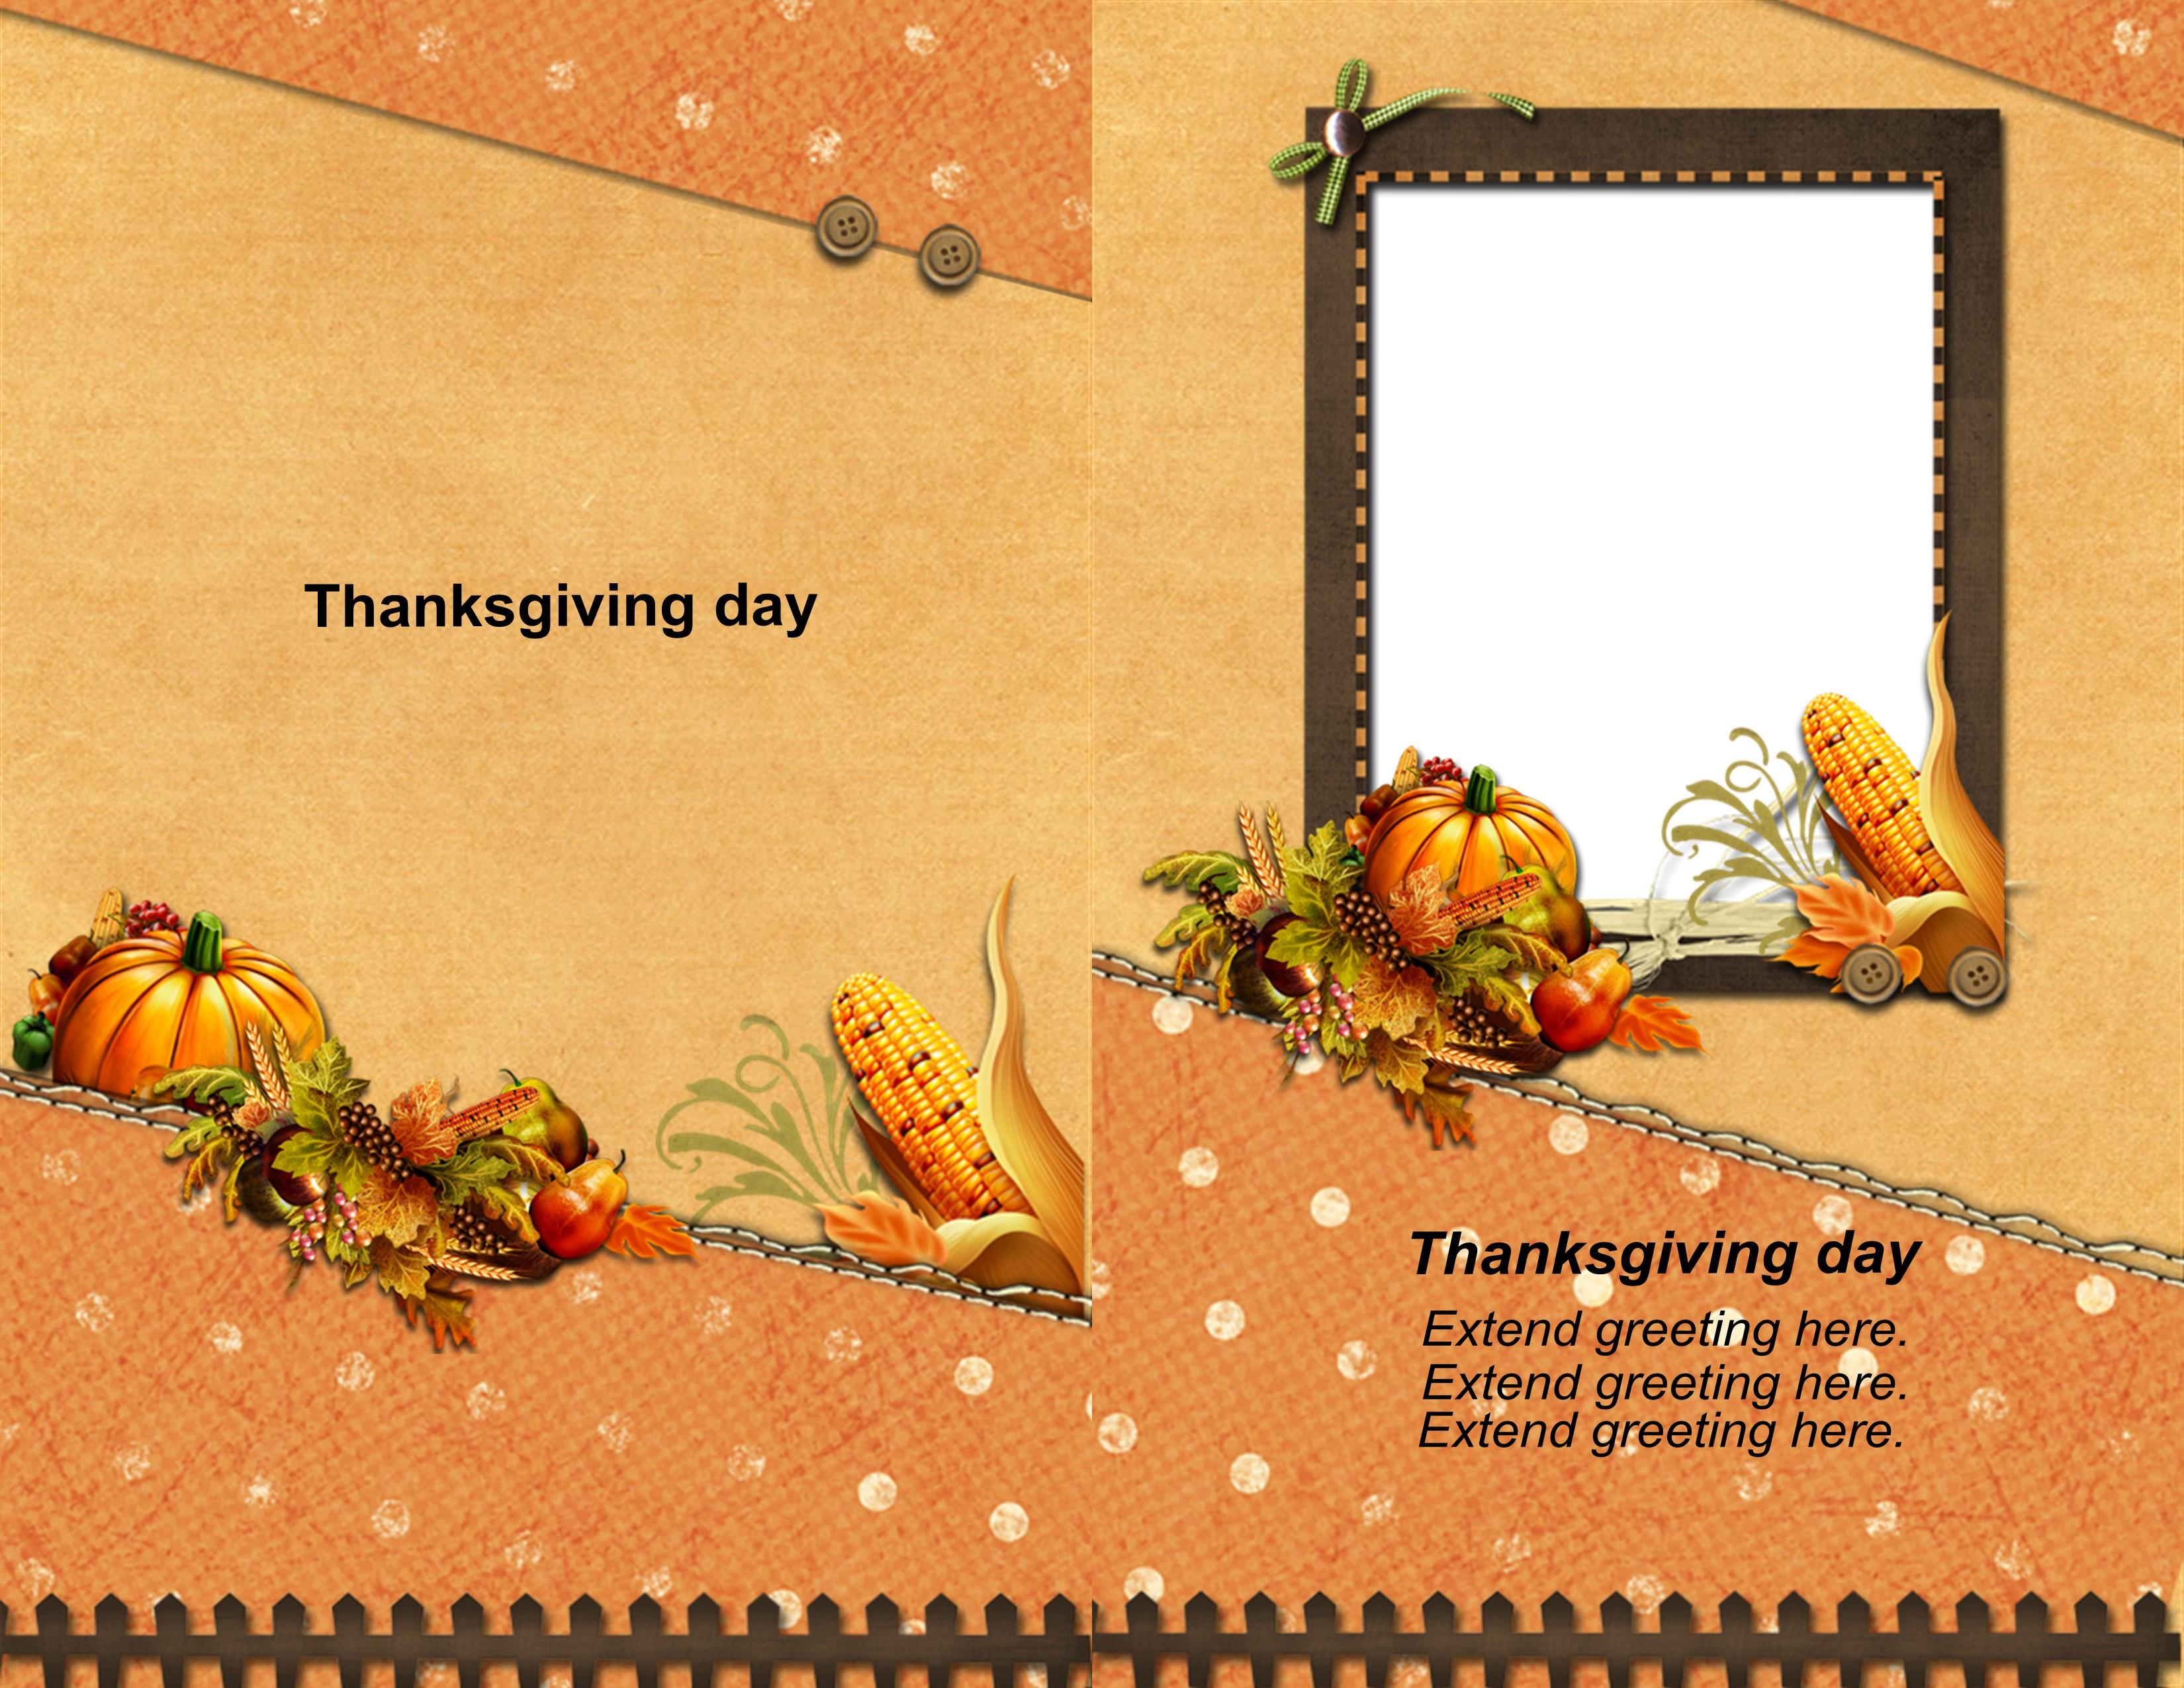 thanksgiving day cards to make wallpapers desktop. Black Bedroom Furniture Sets. Home Design Ideas